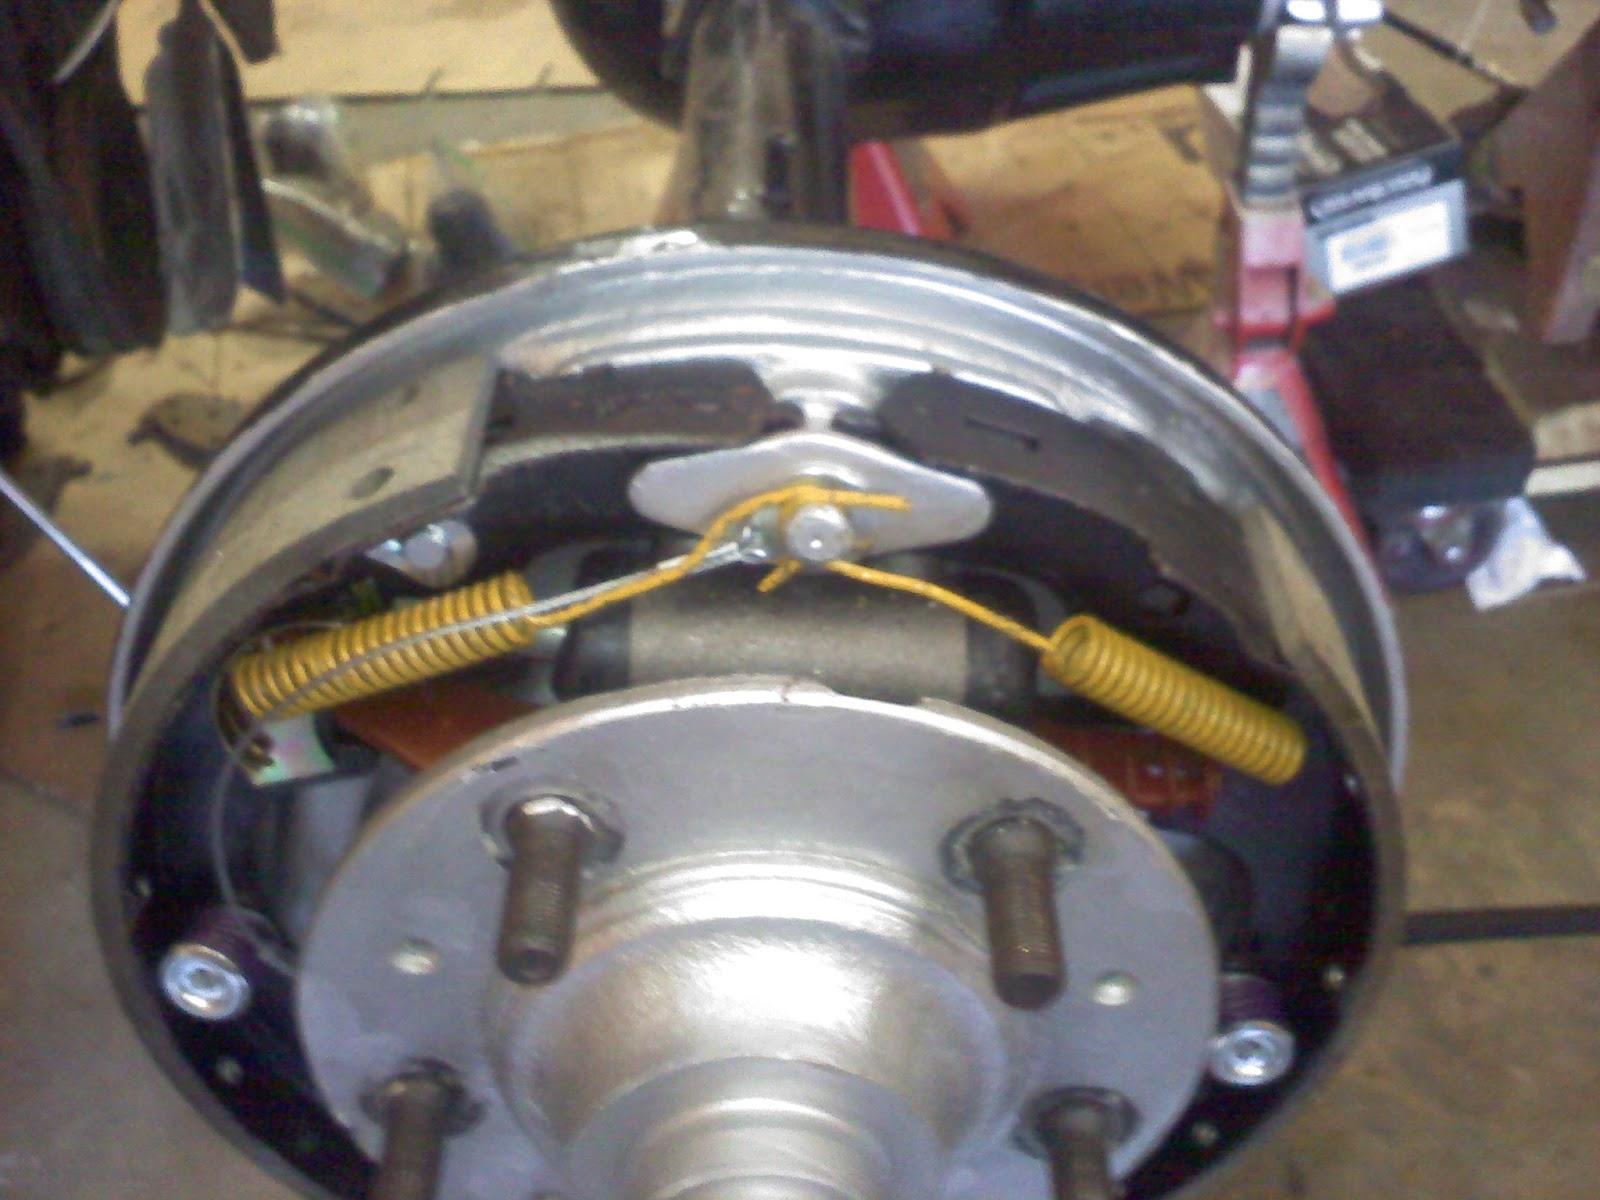 Cj5 Rear Brake Diagram | Wiring Diagram